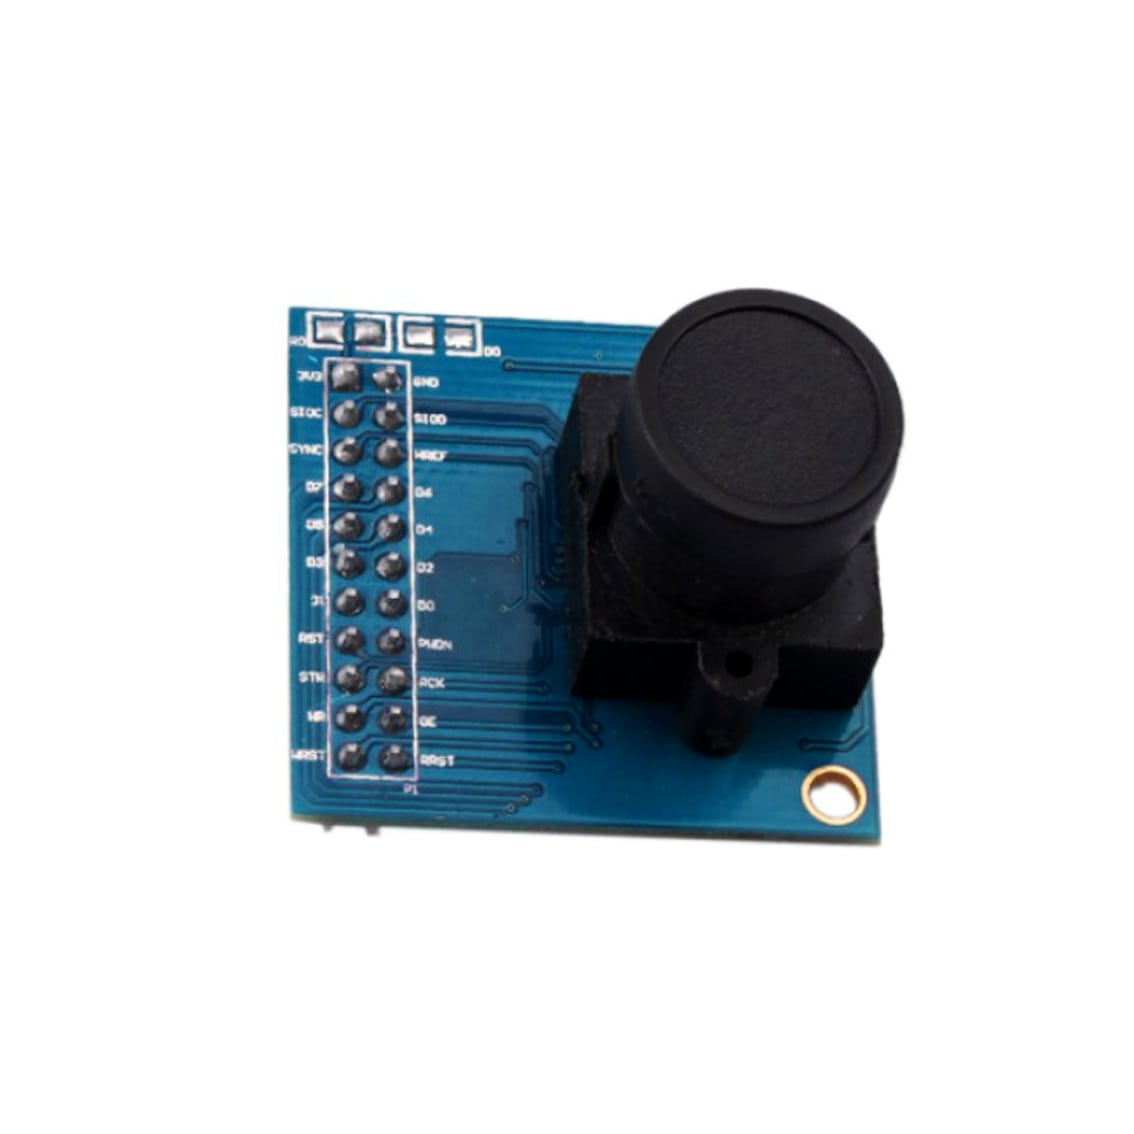 OV7670 FIFO Camera Module